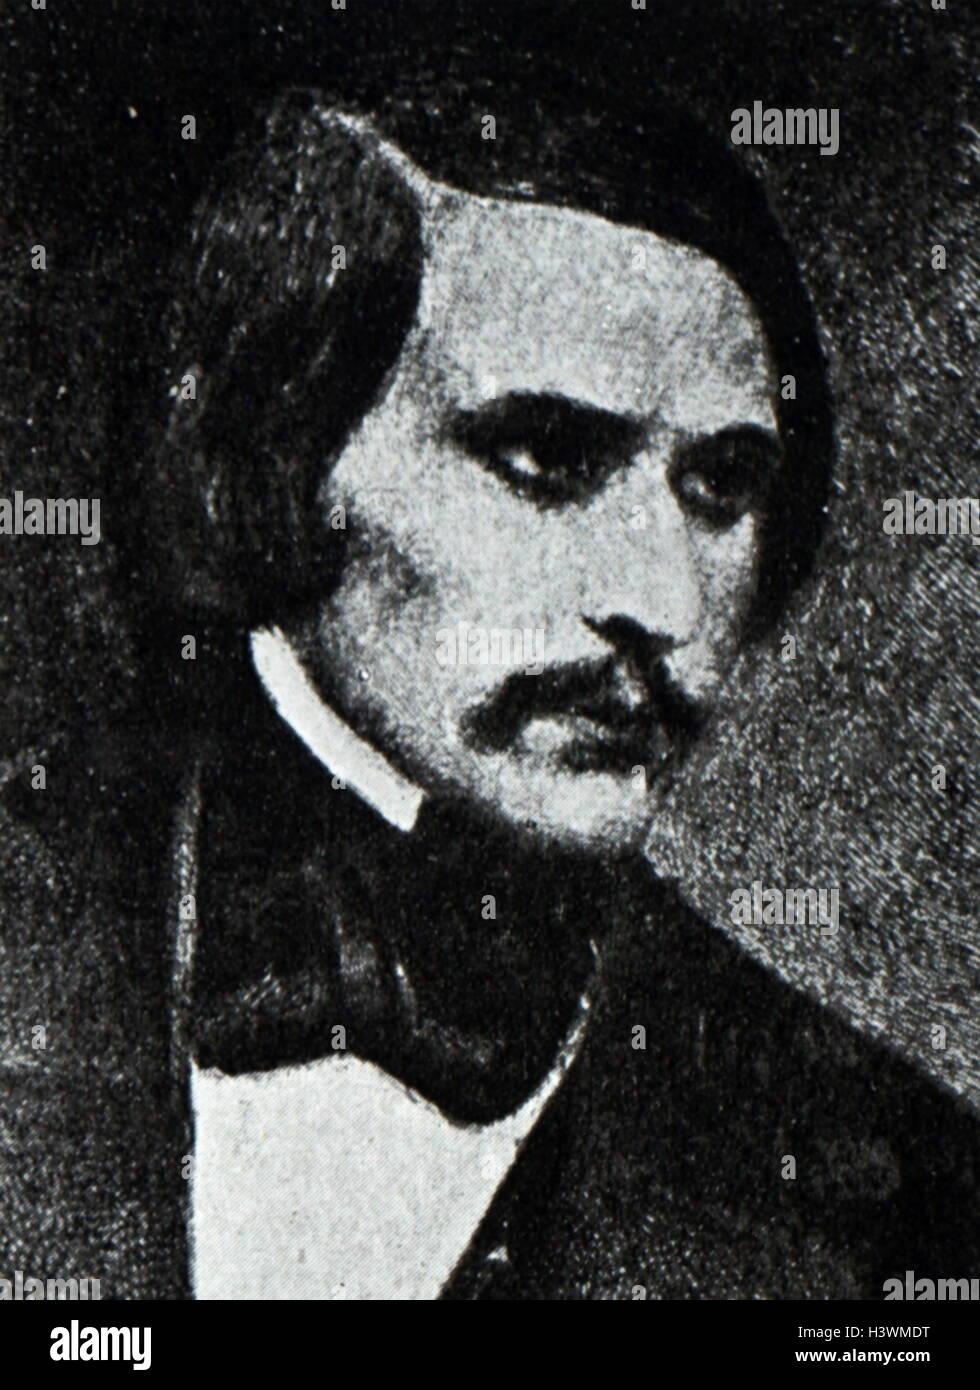 Portrait of Nikolai Gogol - Stock Image